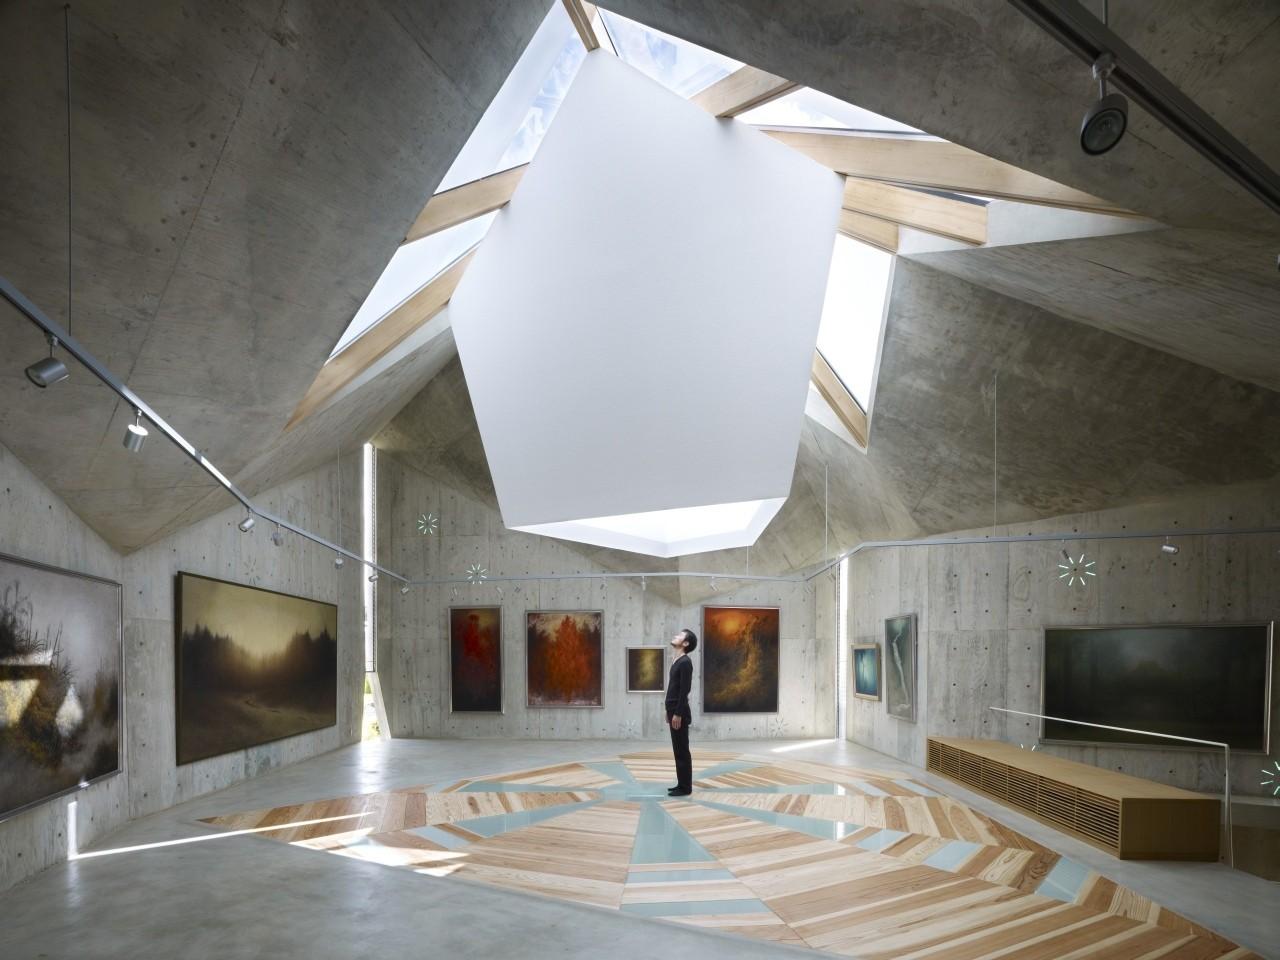 Gallery of Mecenat Art Museum  Naf Architect  Design  12